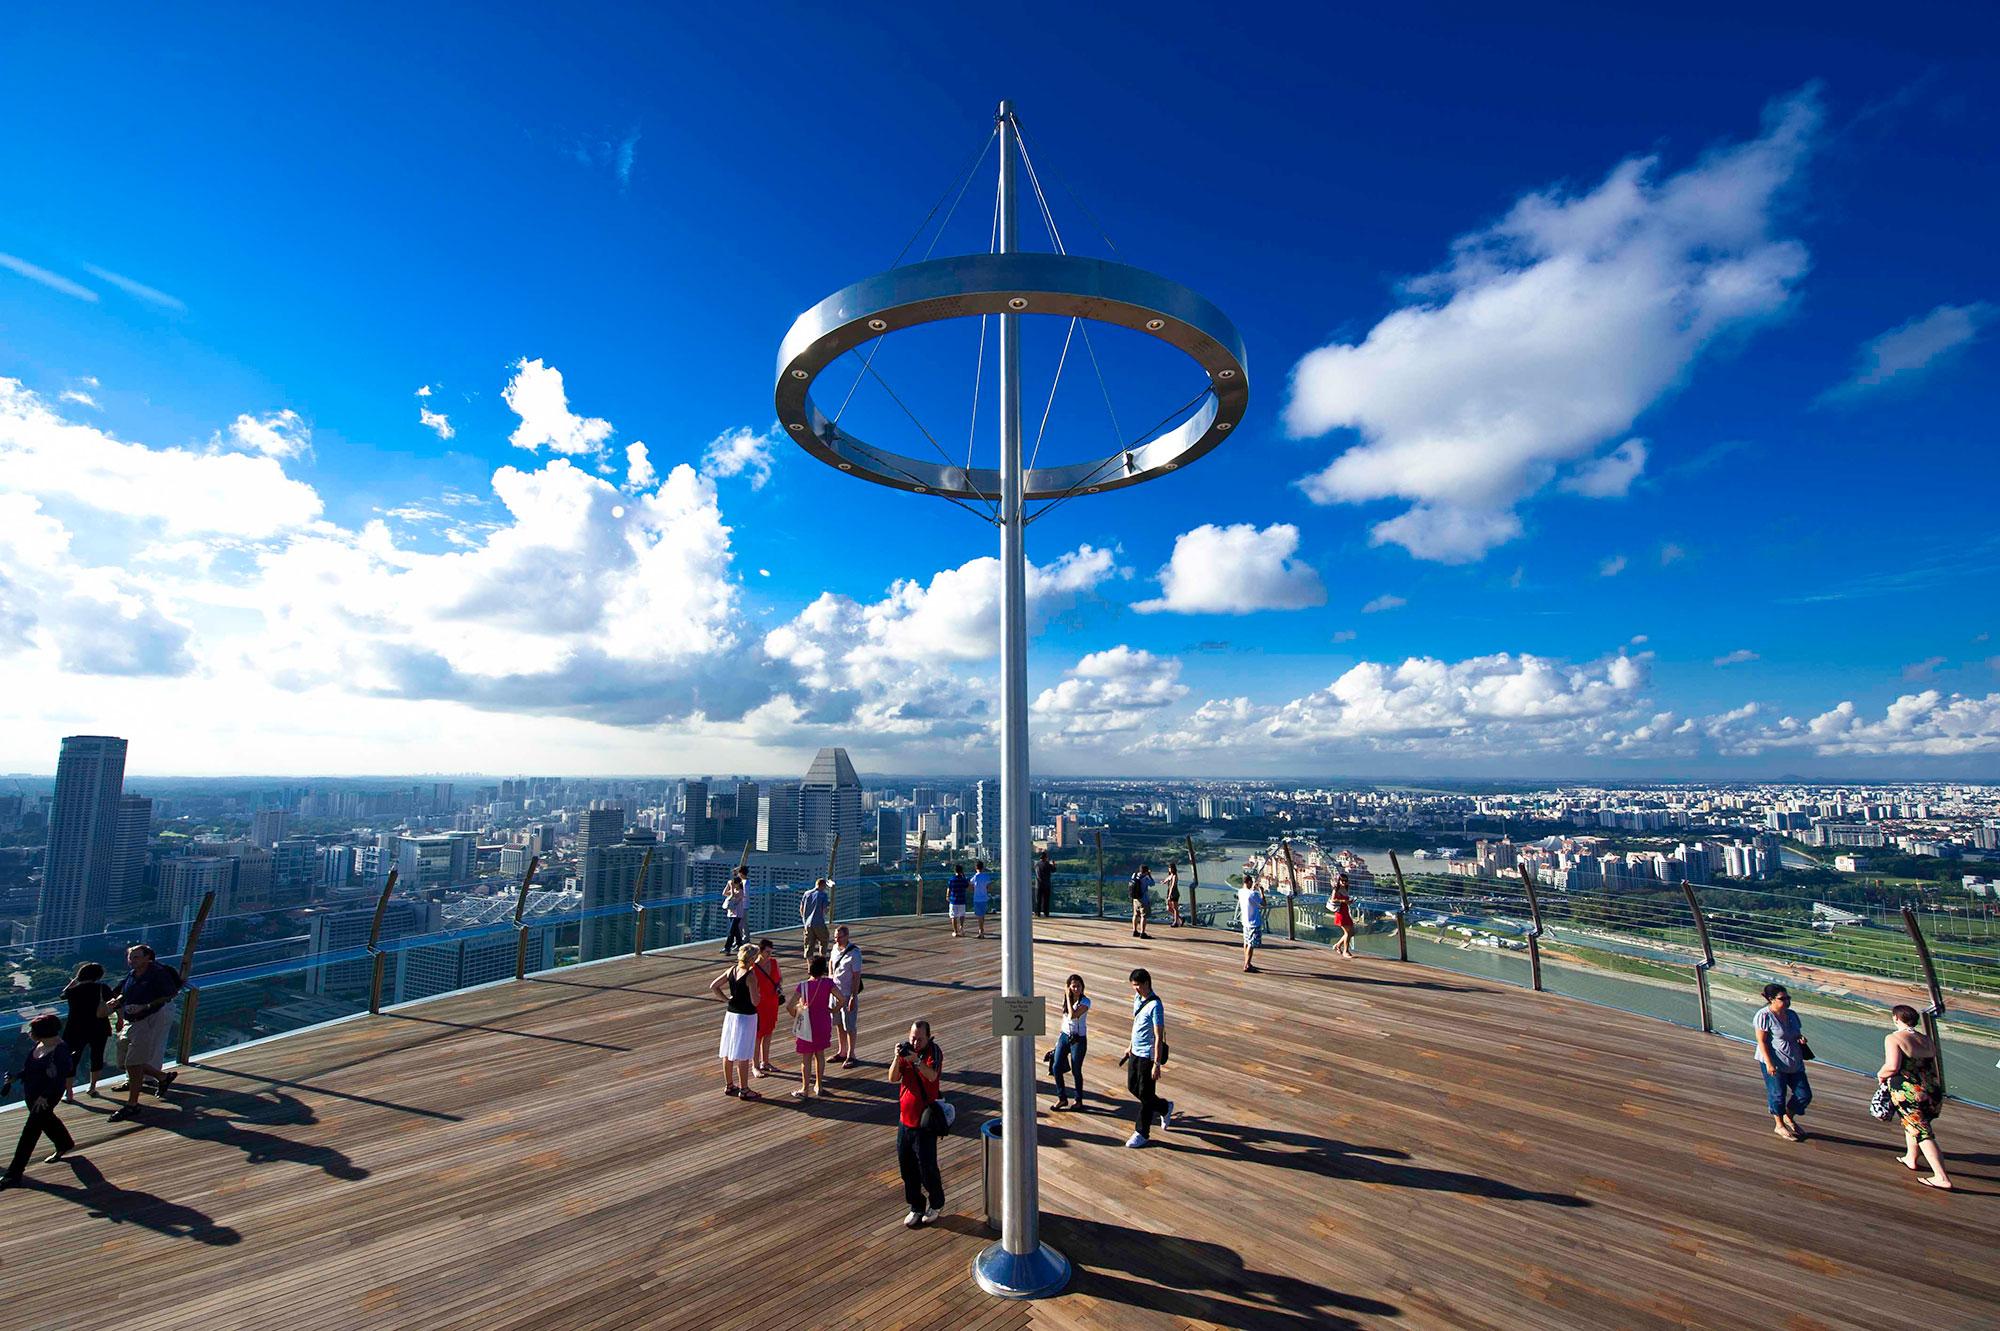 SkyPark-Public-Observation-Deck